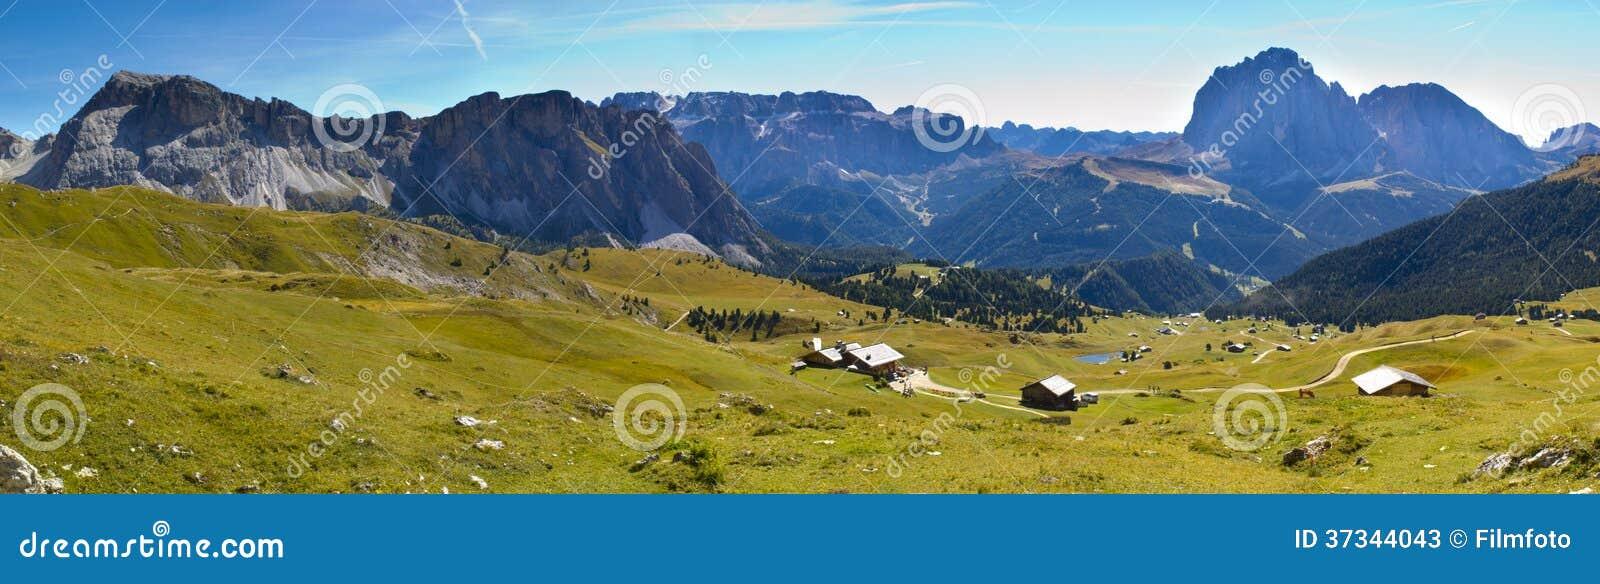 Panorama von Alpendolomit